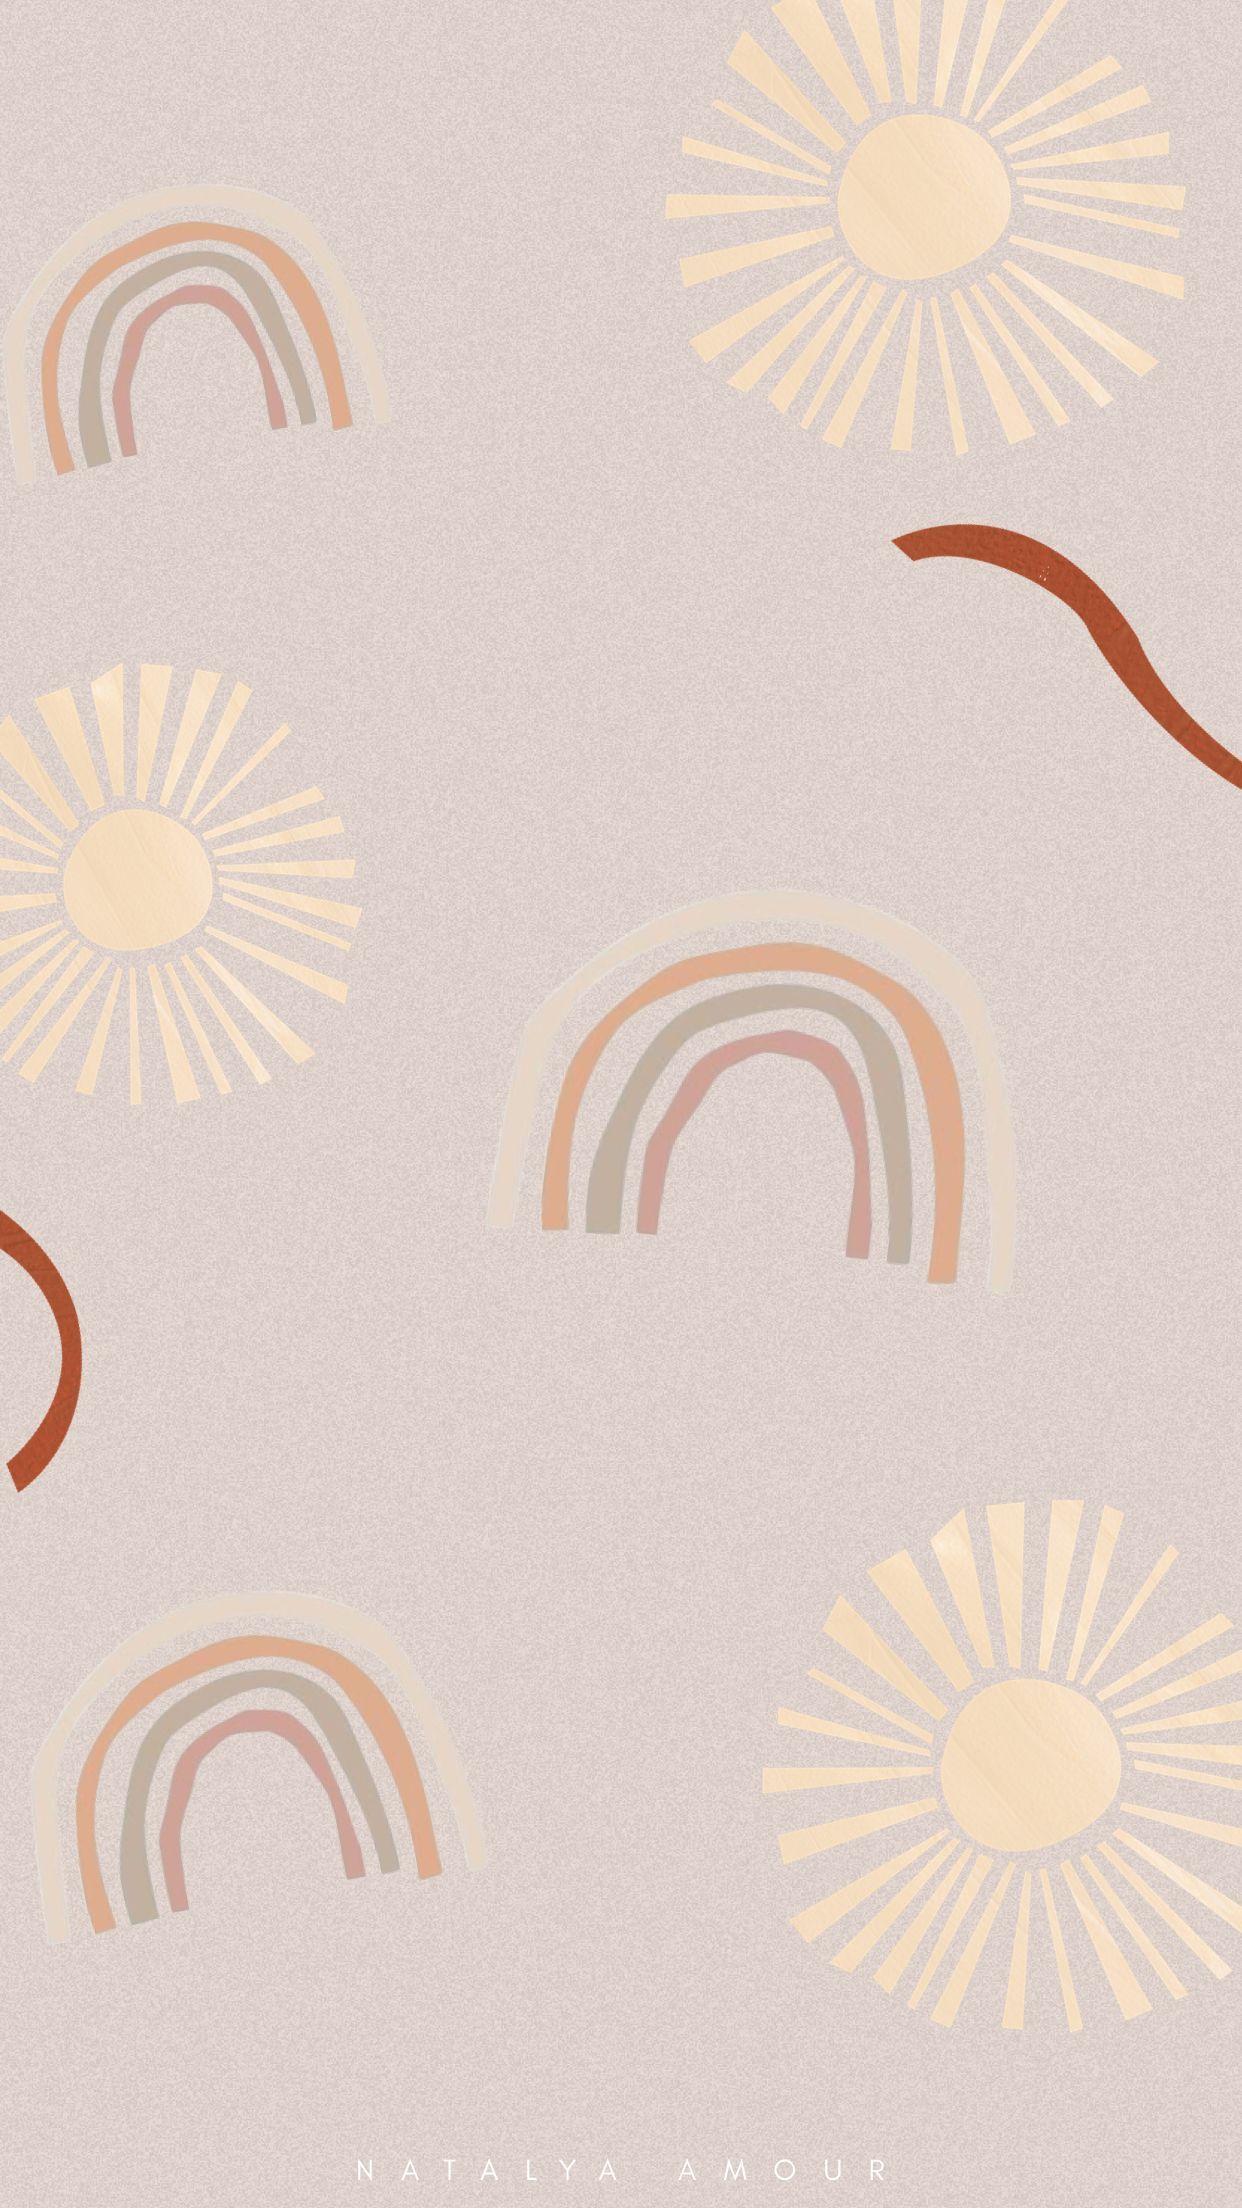 Januari Wallpaper Freebies   - || lockscreen ✰ #achtergrond #telefoon